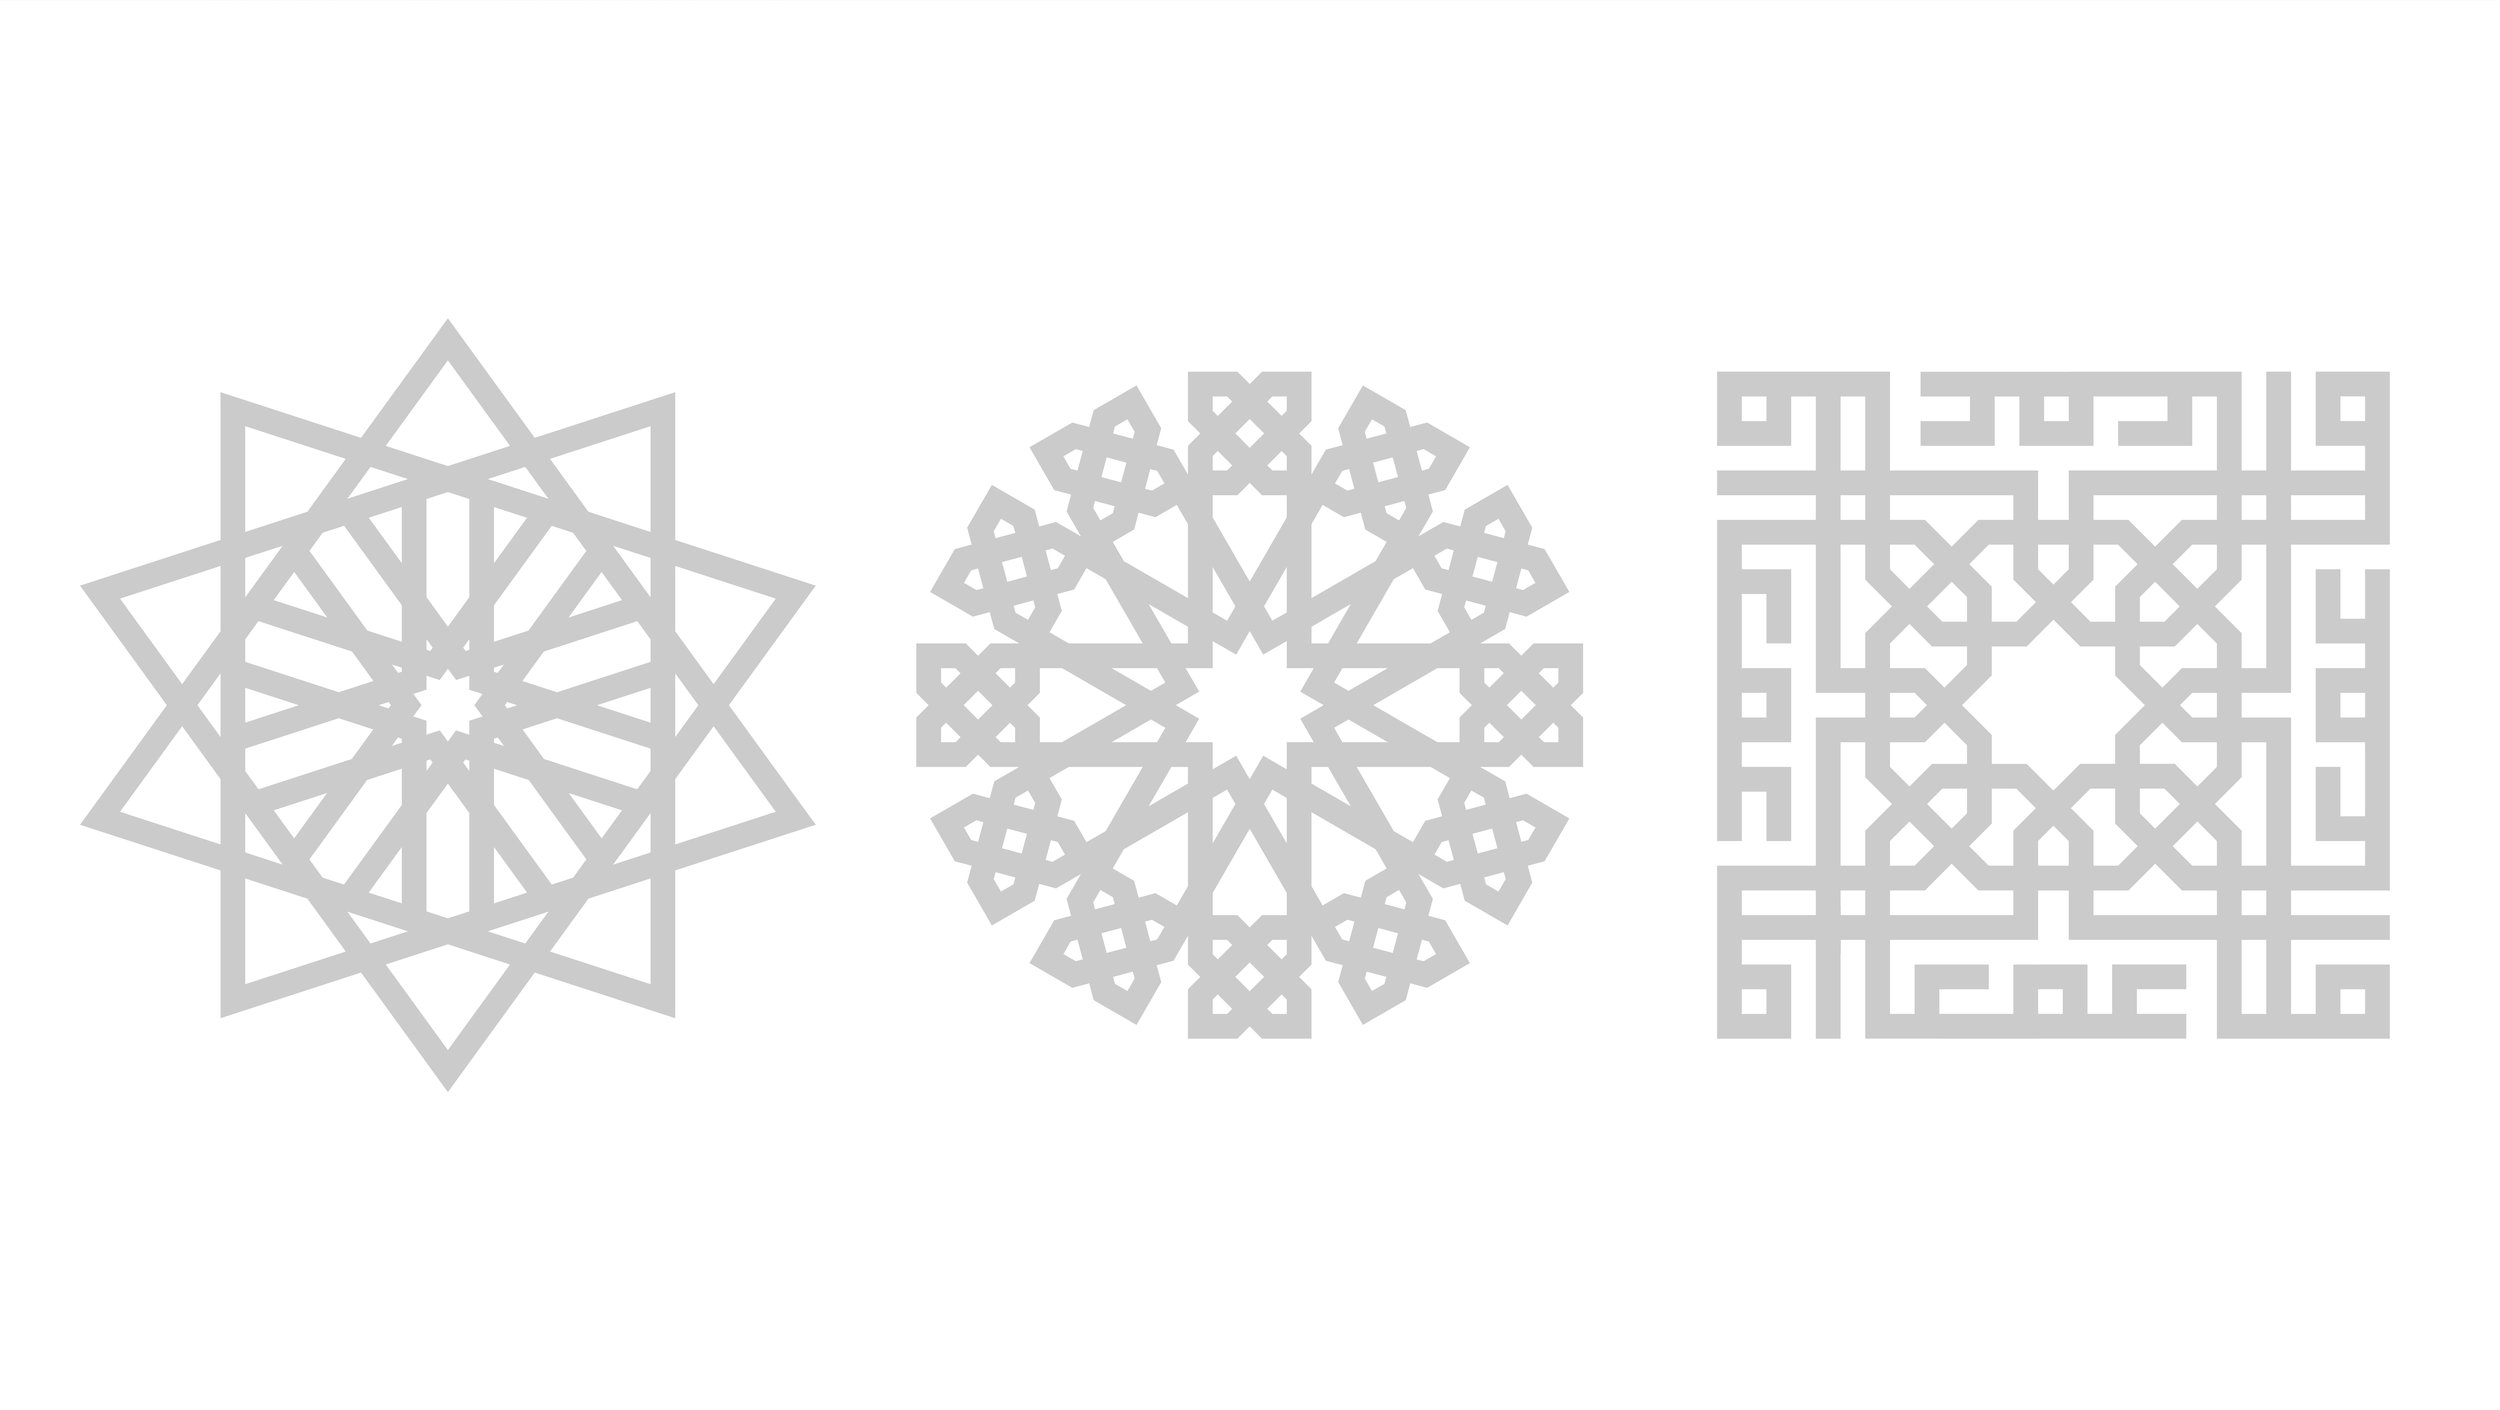 Khaled-Hosseini-Website-03.jpg